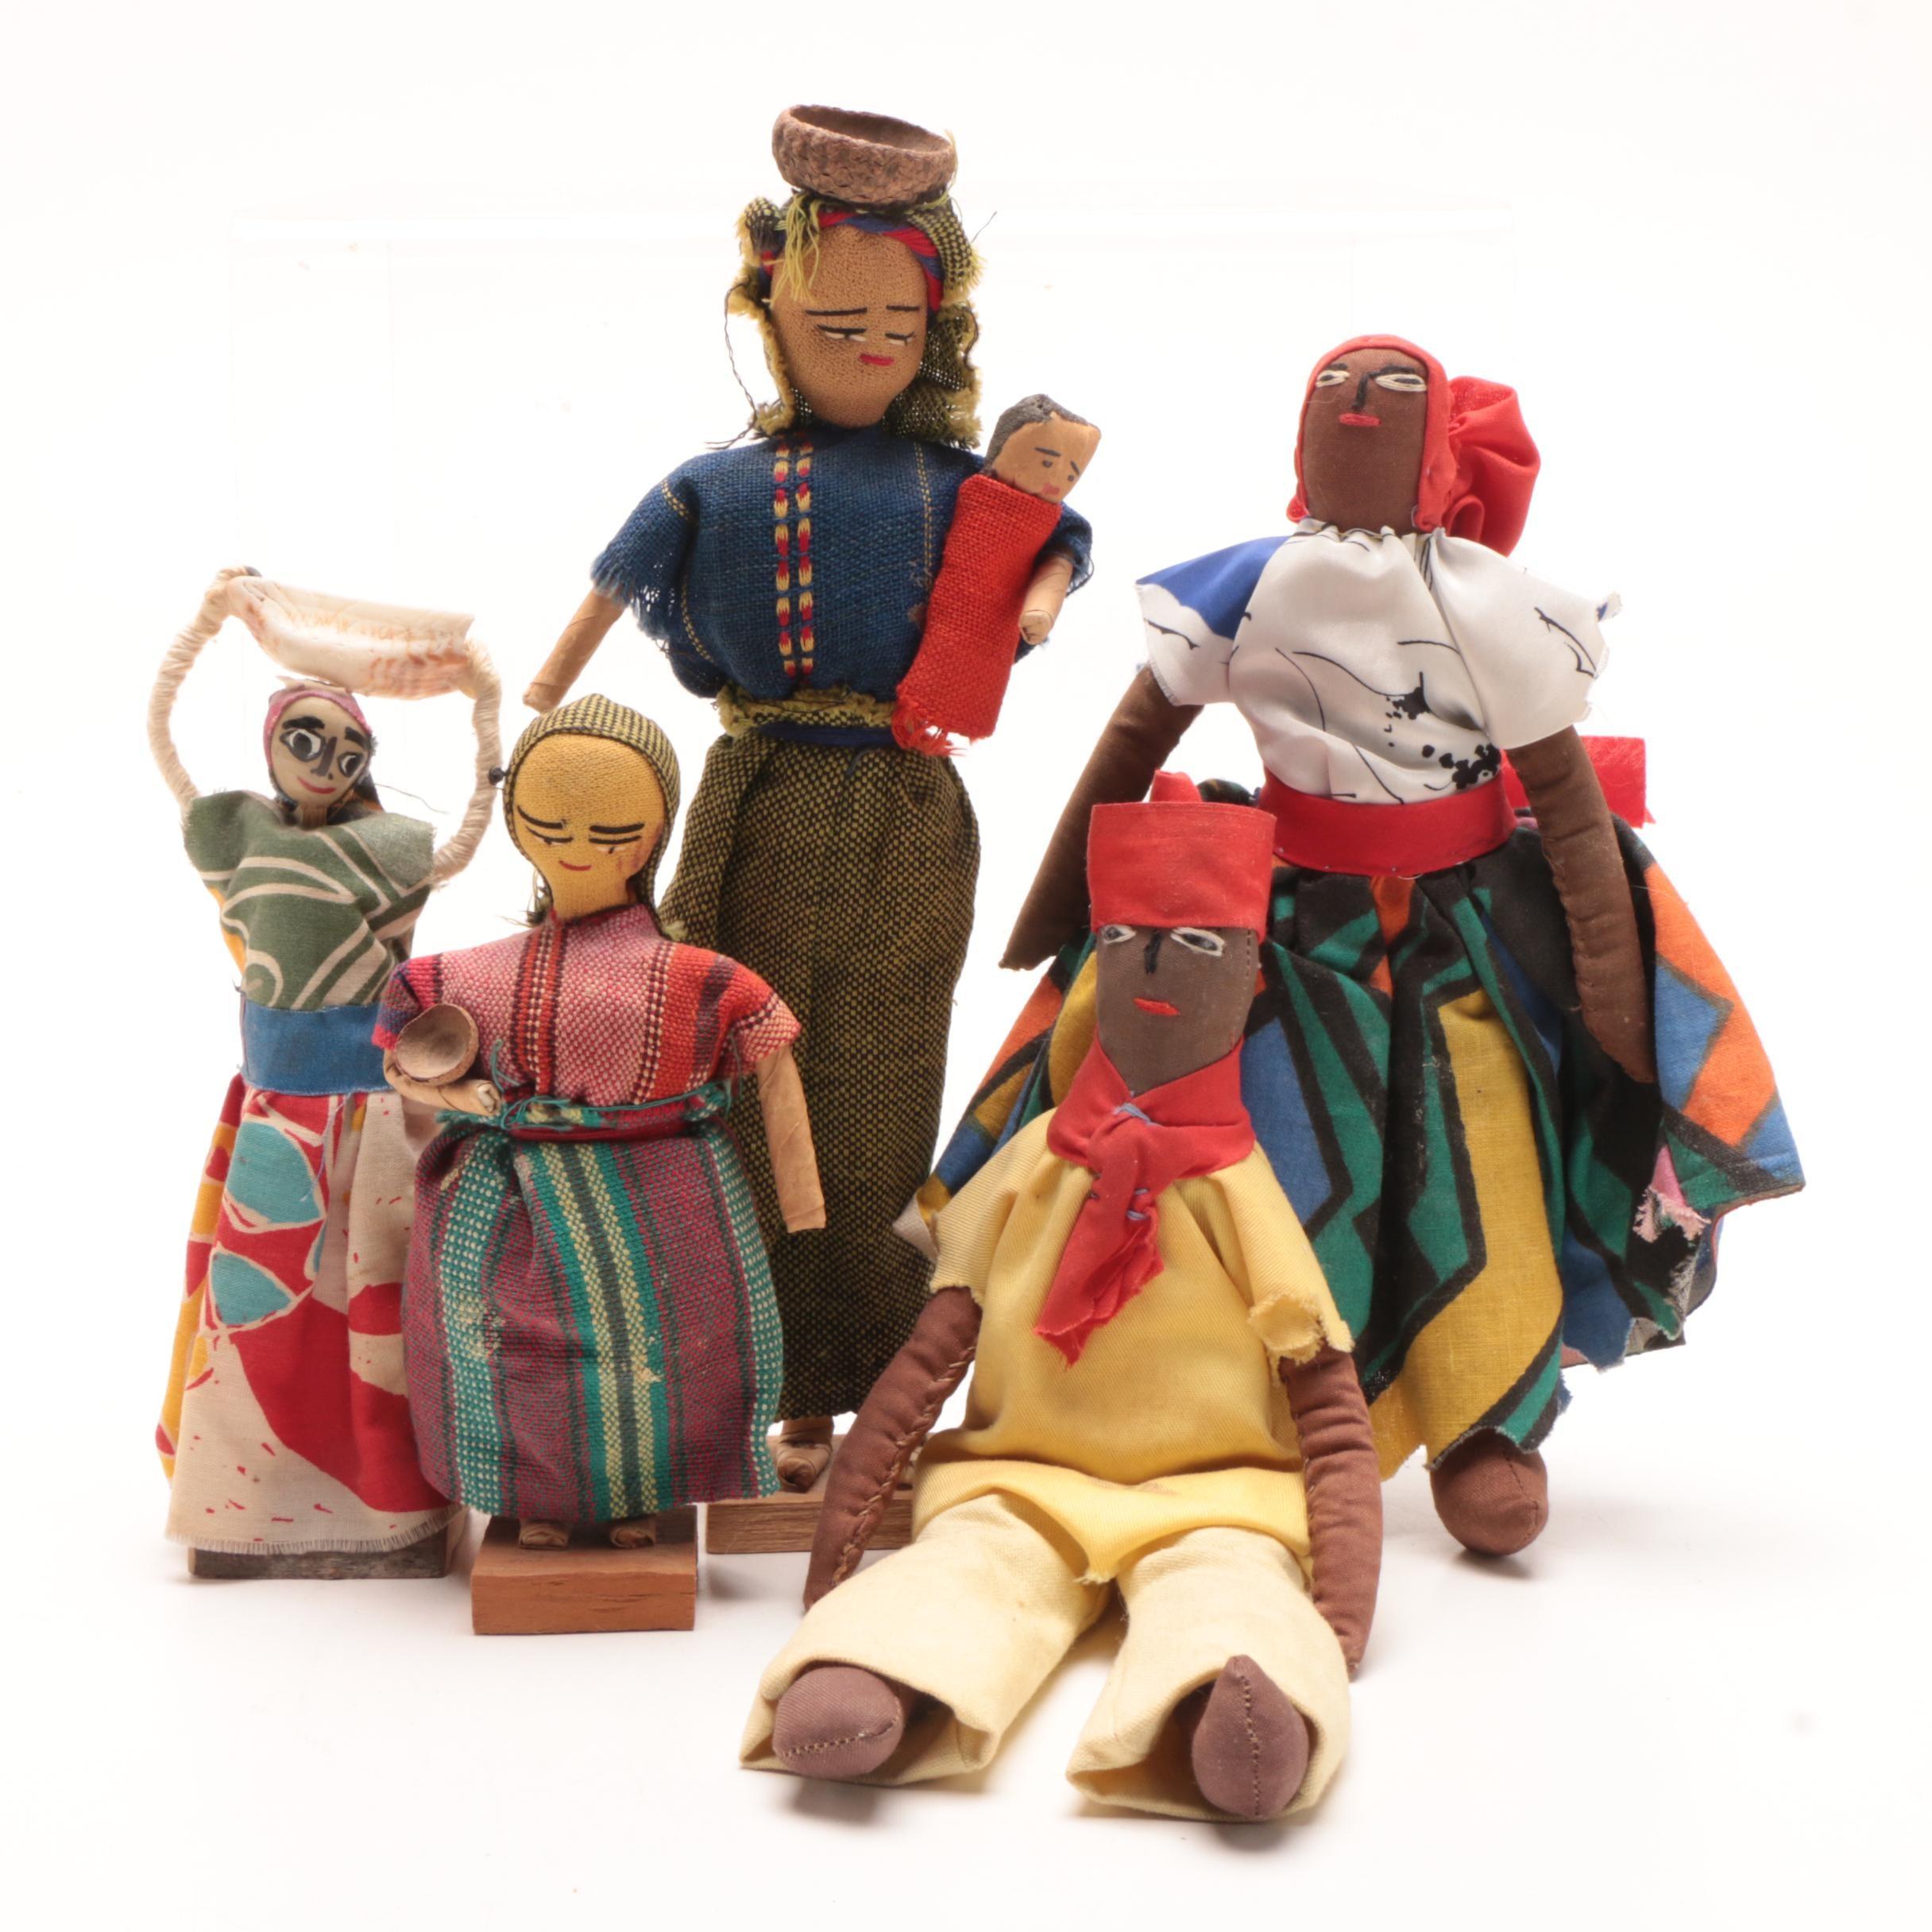 Cloth Handmade Souvenir Dolls